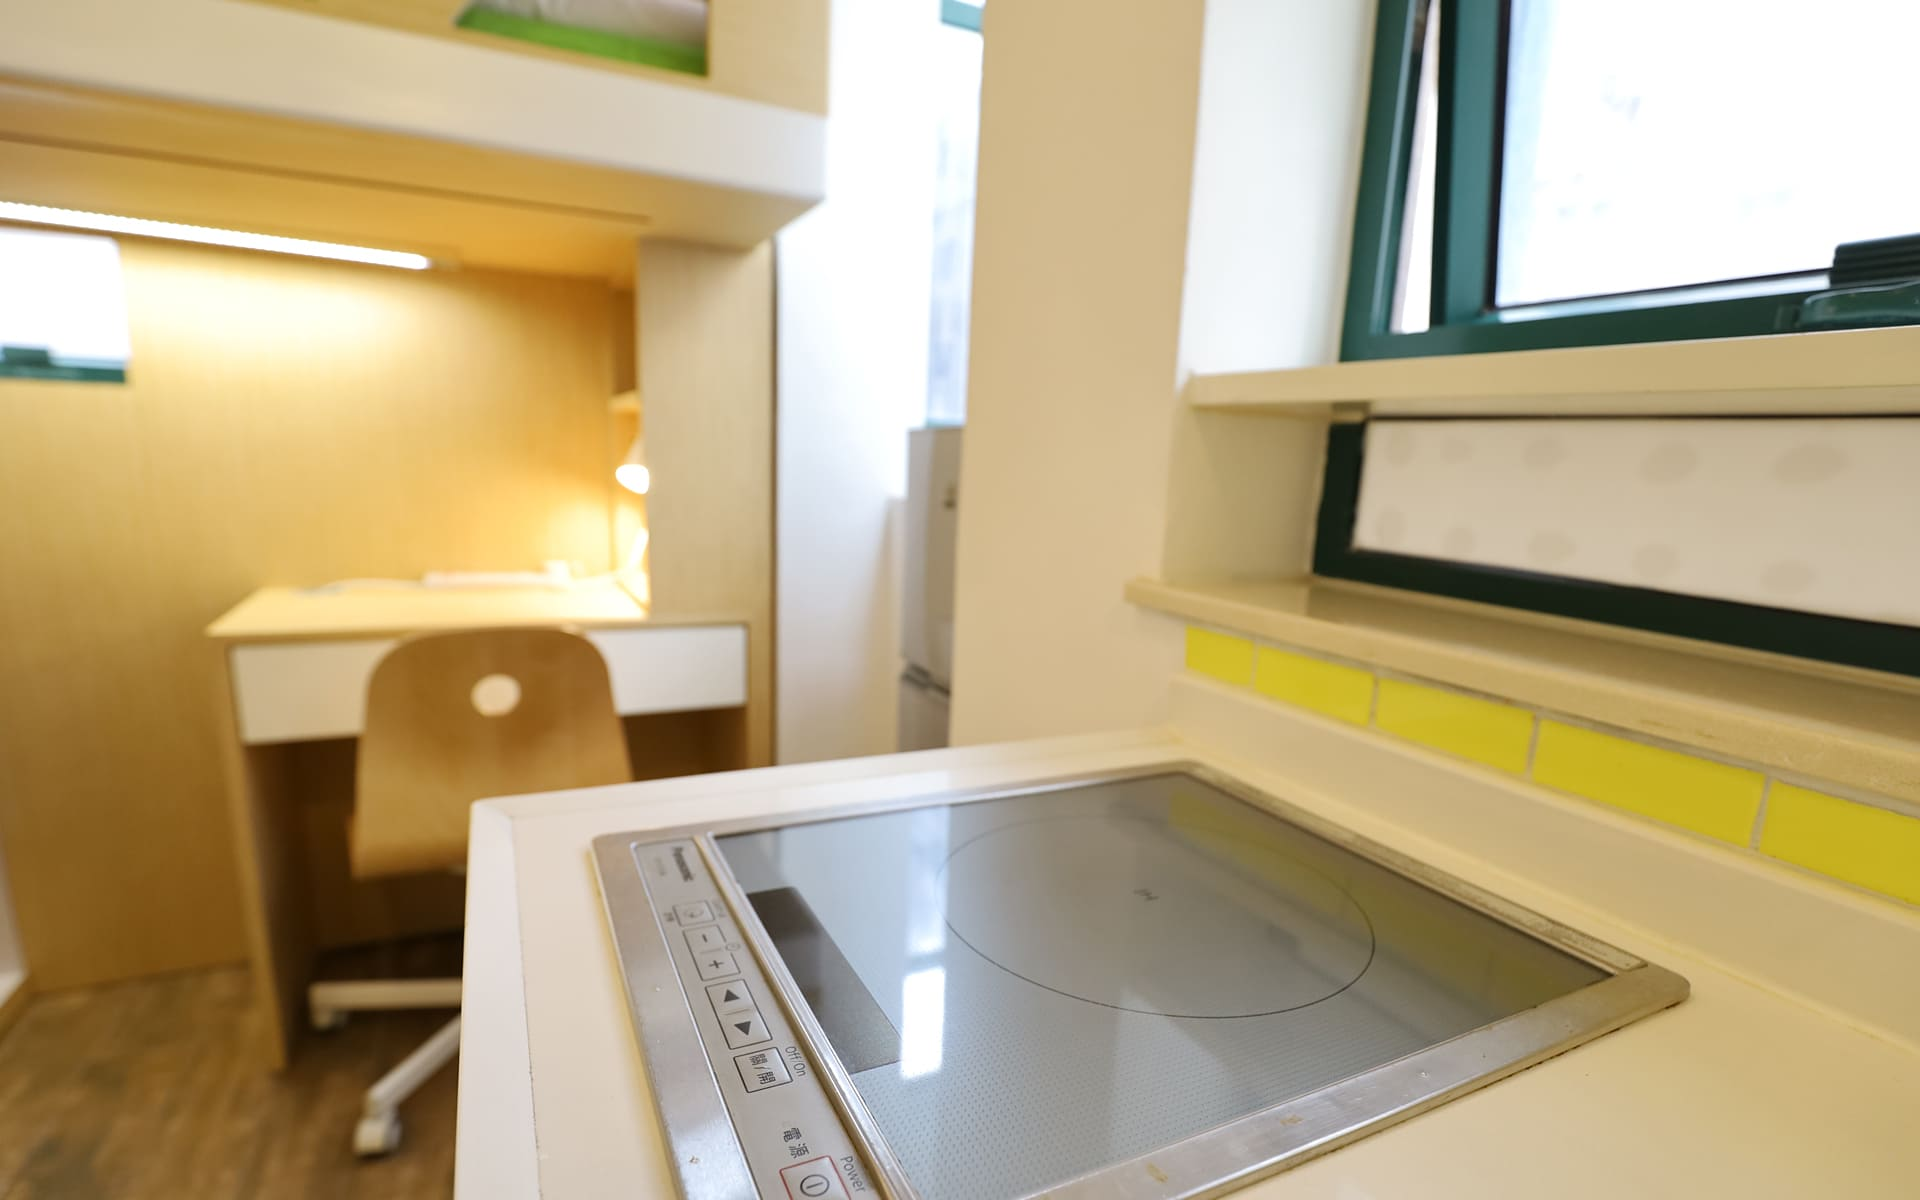 hk_service_apartment_11019762461583918690.jpg